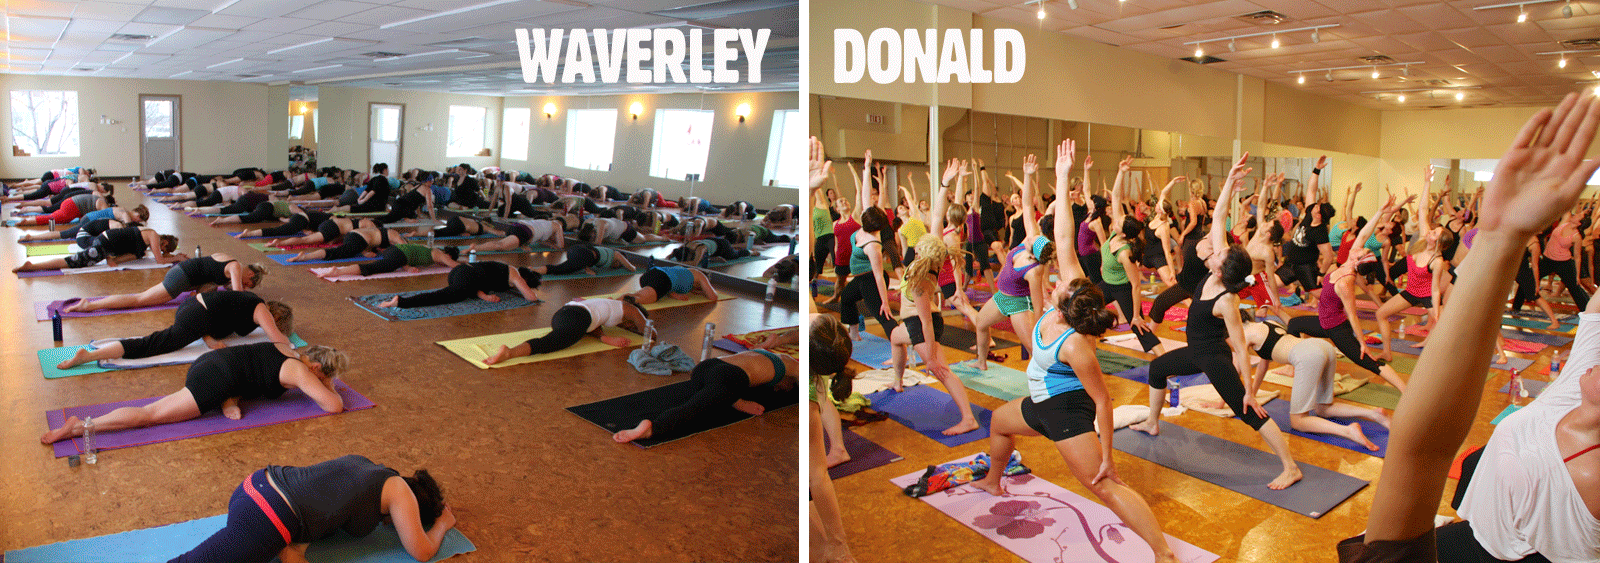 Moksha Yoga Winnipeg - Winnipeg Meeting Locations